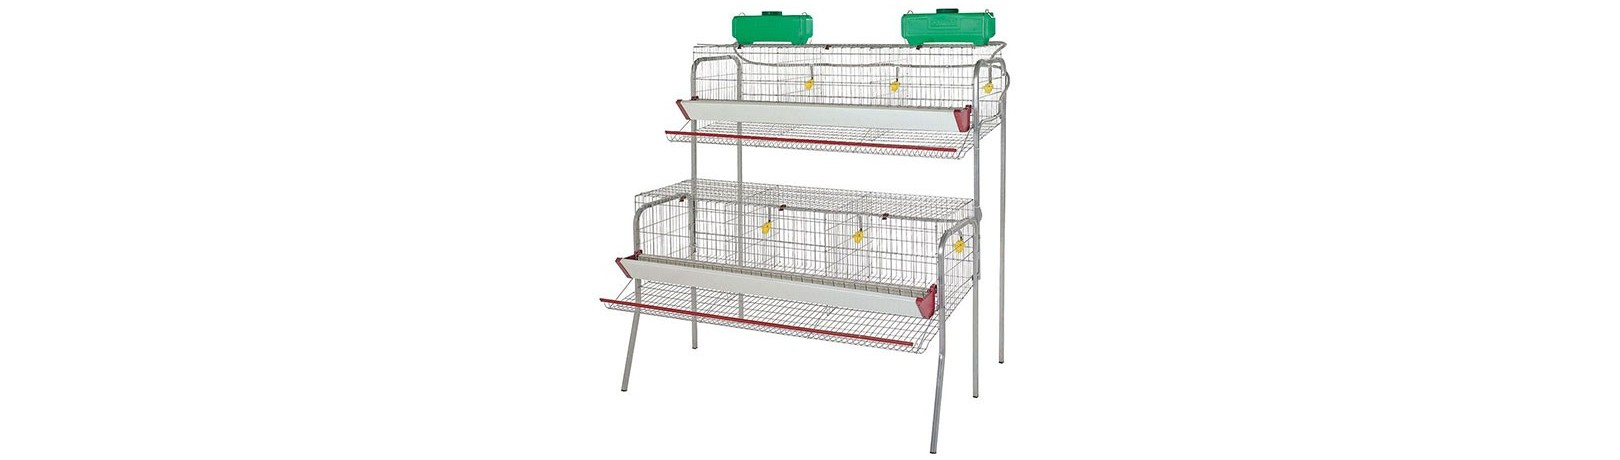 Fabricante de Jaulas para gallinas - Fabrica Jaula Aves